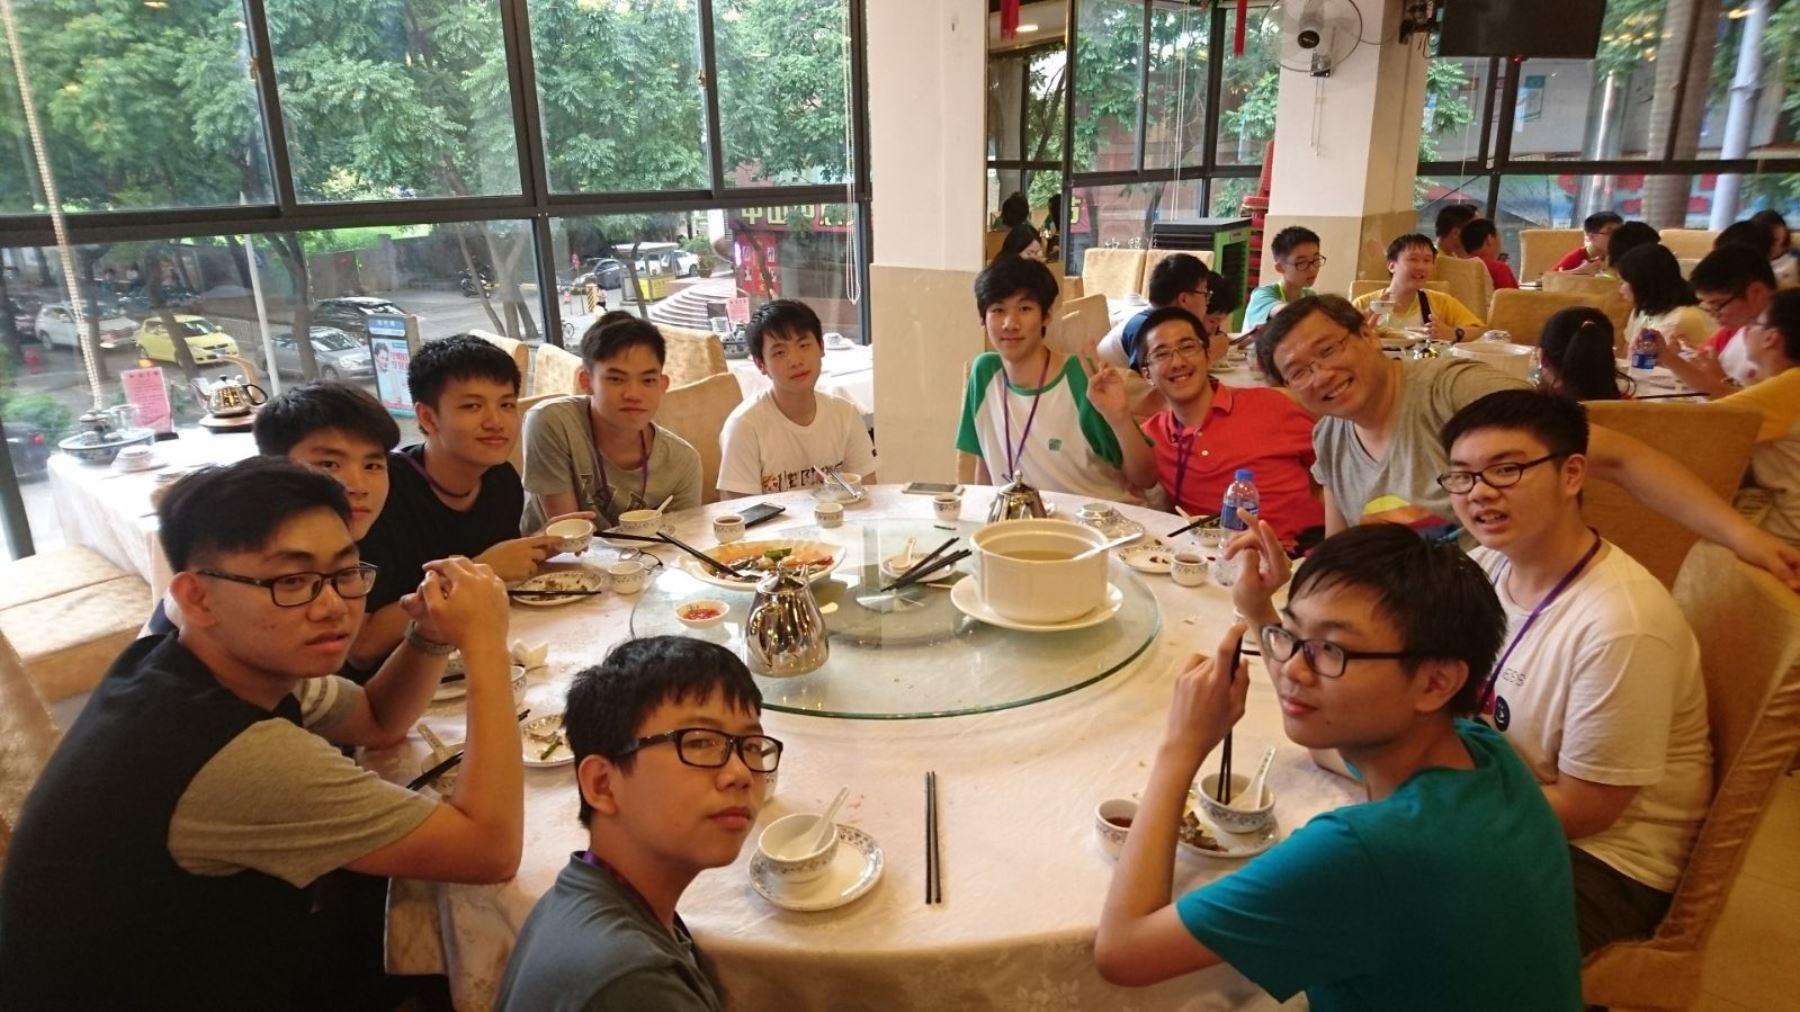 http://www.npc.edu.hk/sites/default/files/img-20170716-wa0019.jpg